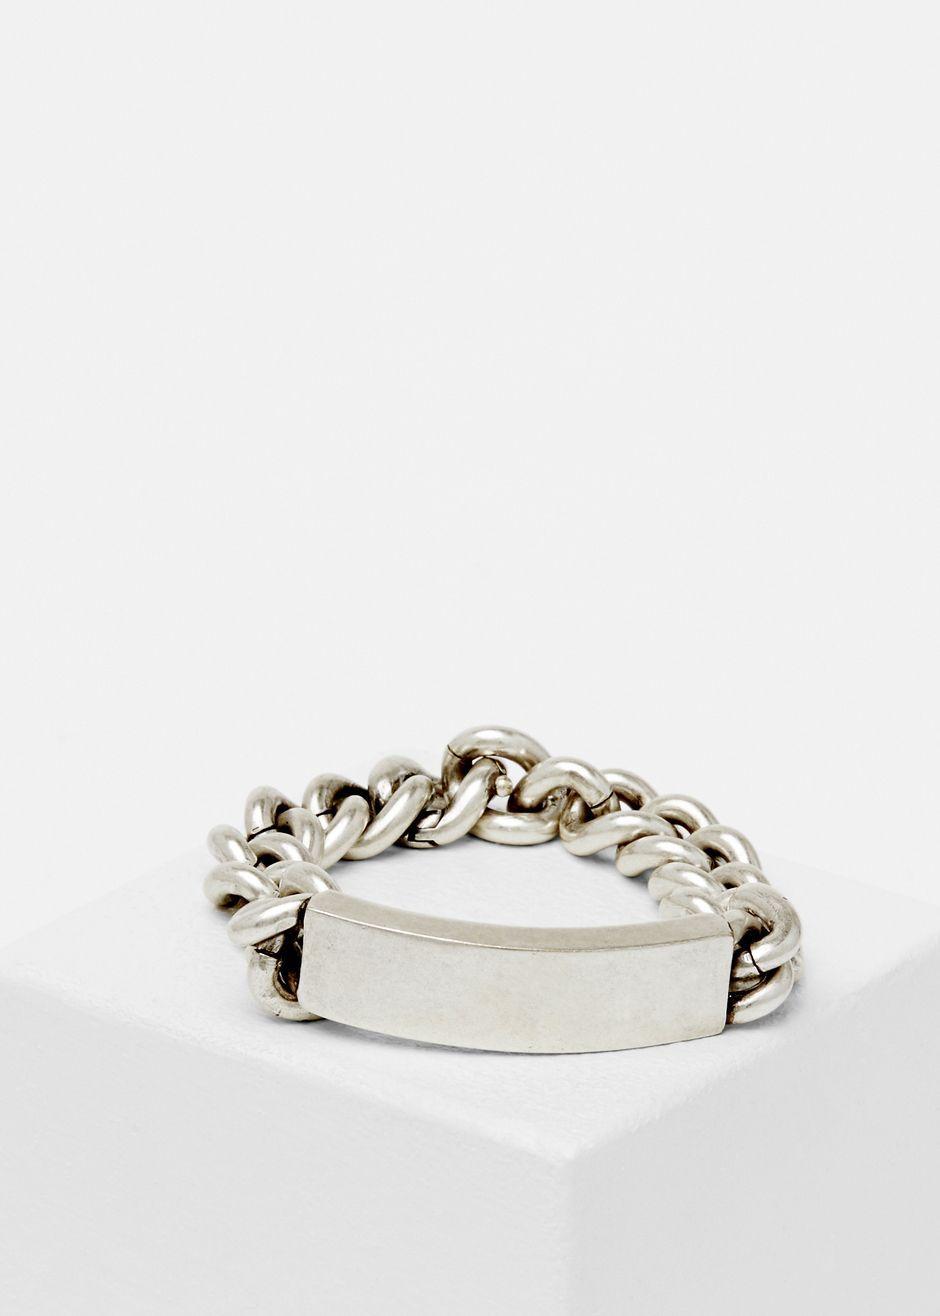 Maison Martin Margiela Id Bracelet Silver